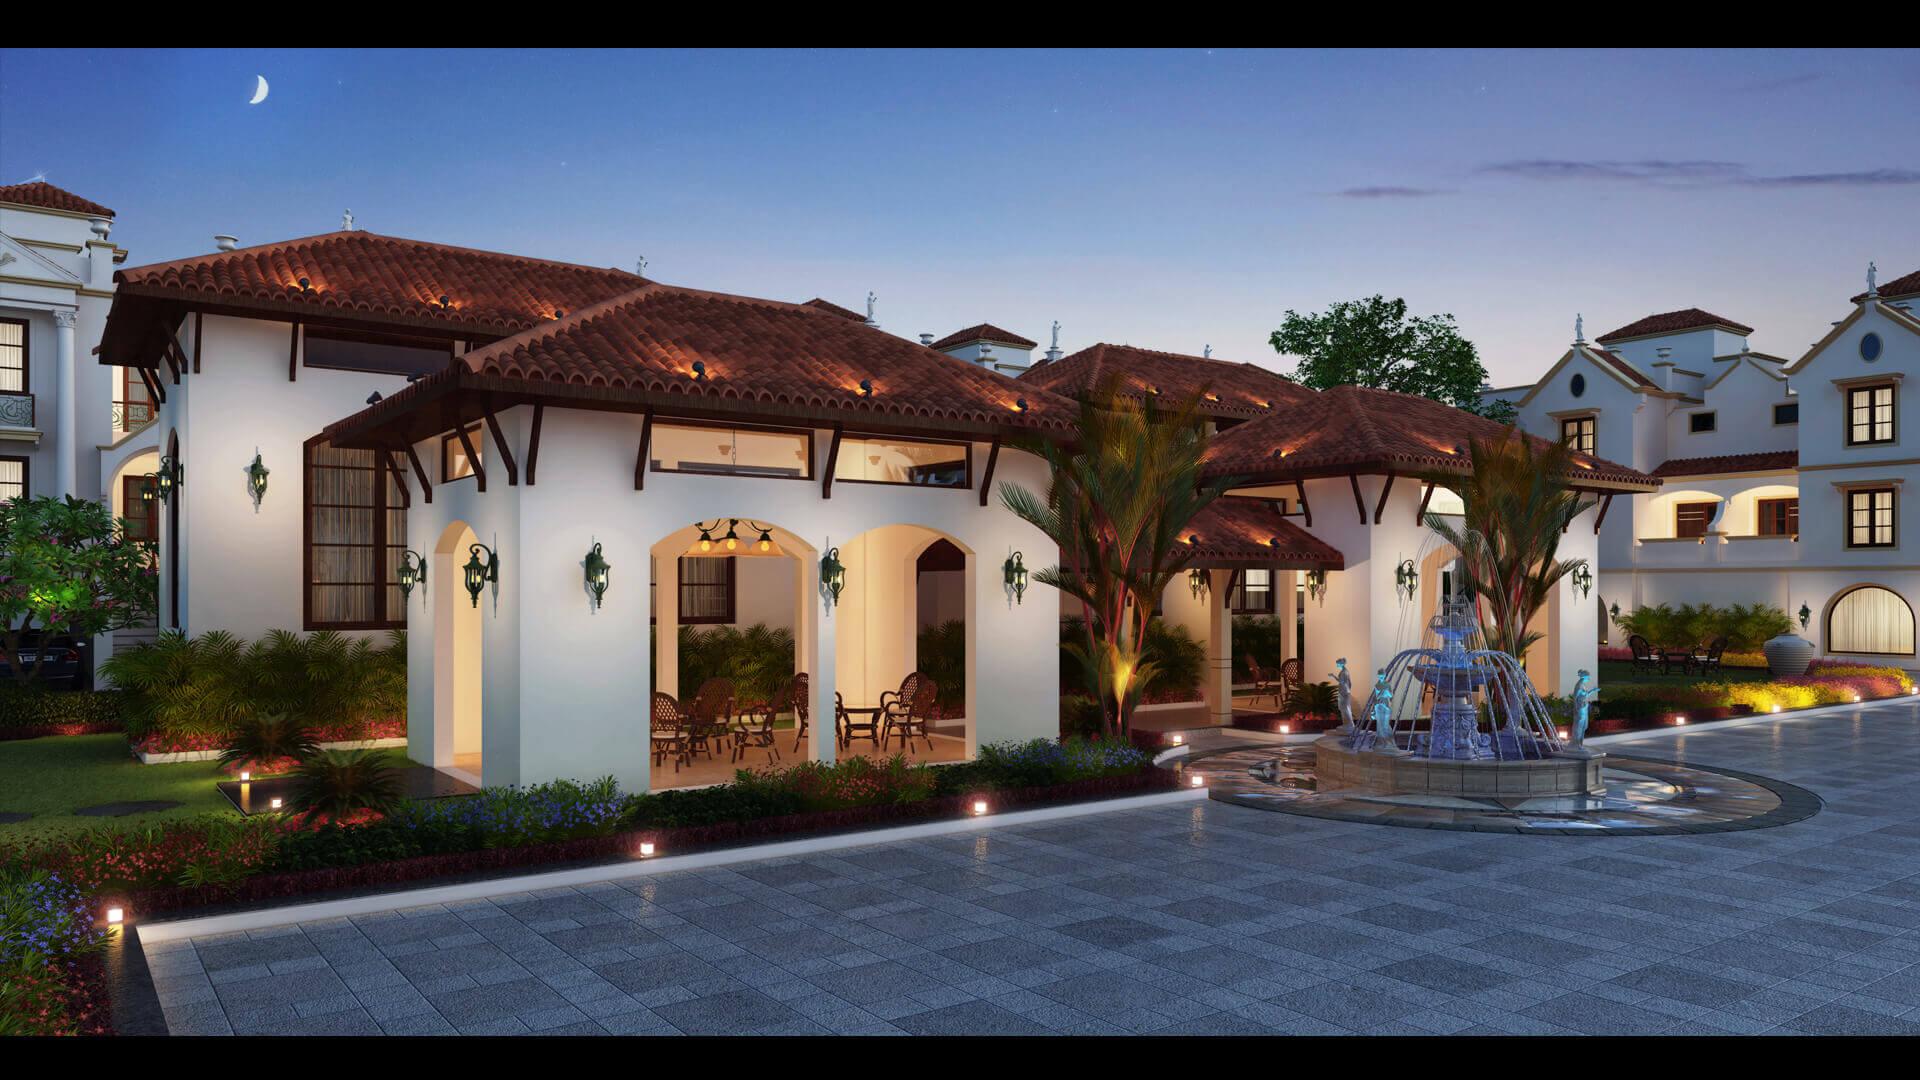 3d House Exterior Night View Design